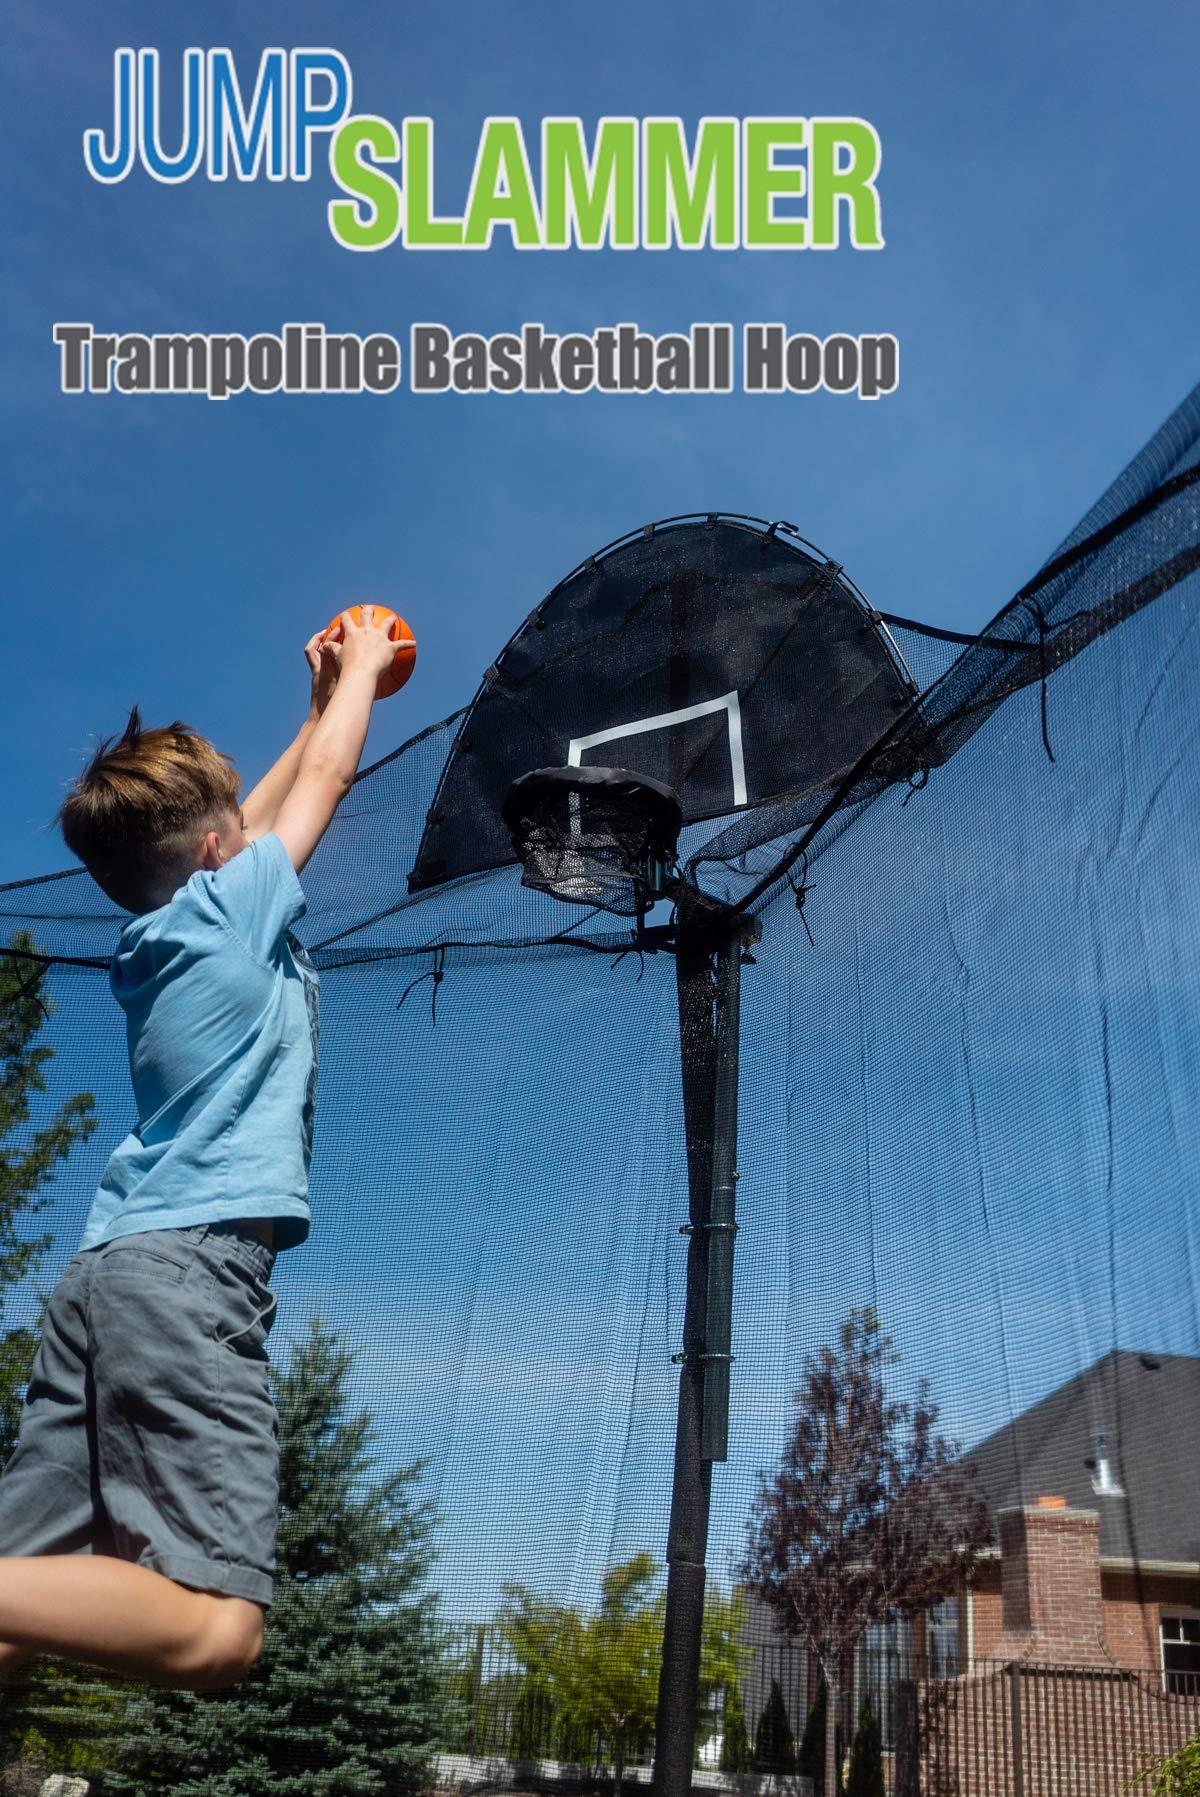 Trampoline Basketball Included Lifetime Warranty